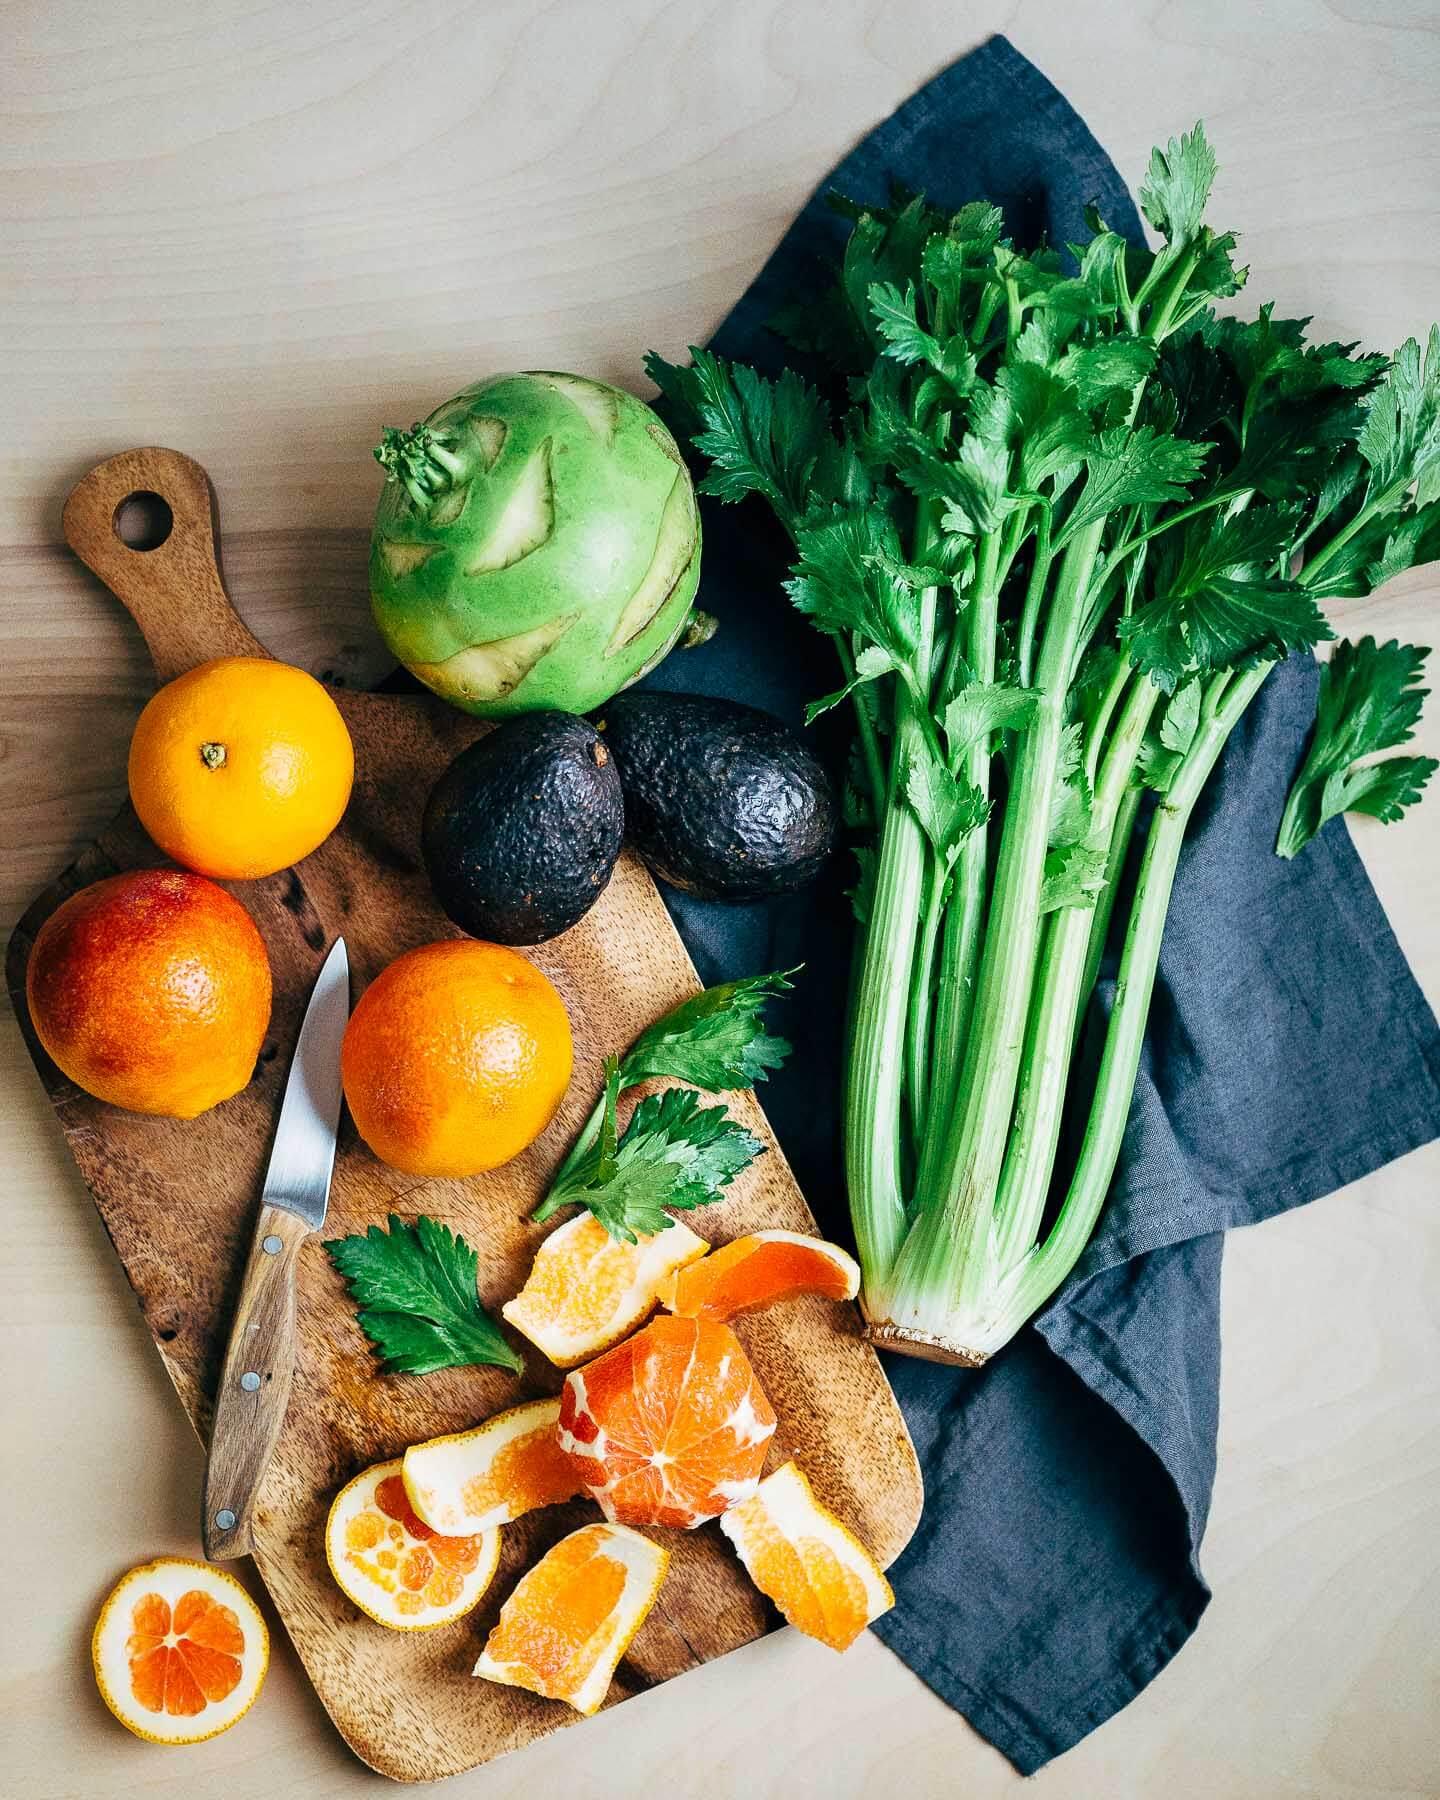 kohlrabi, avocado, and citrus salad // brooklyn supper